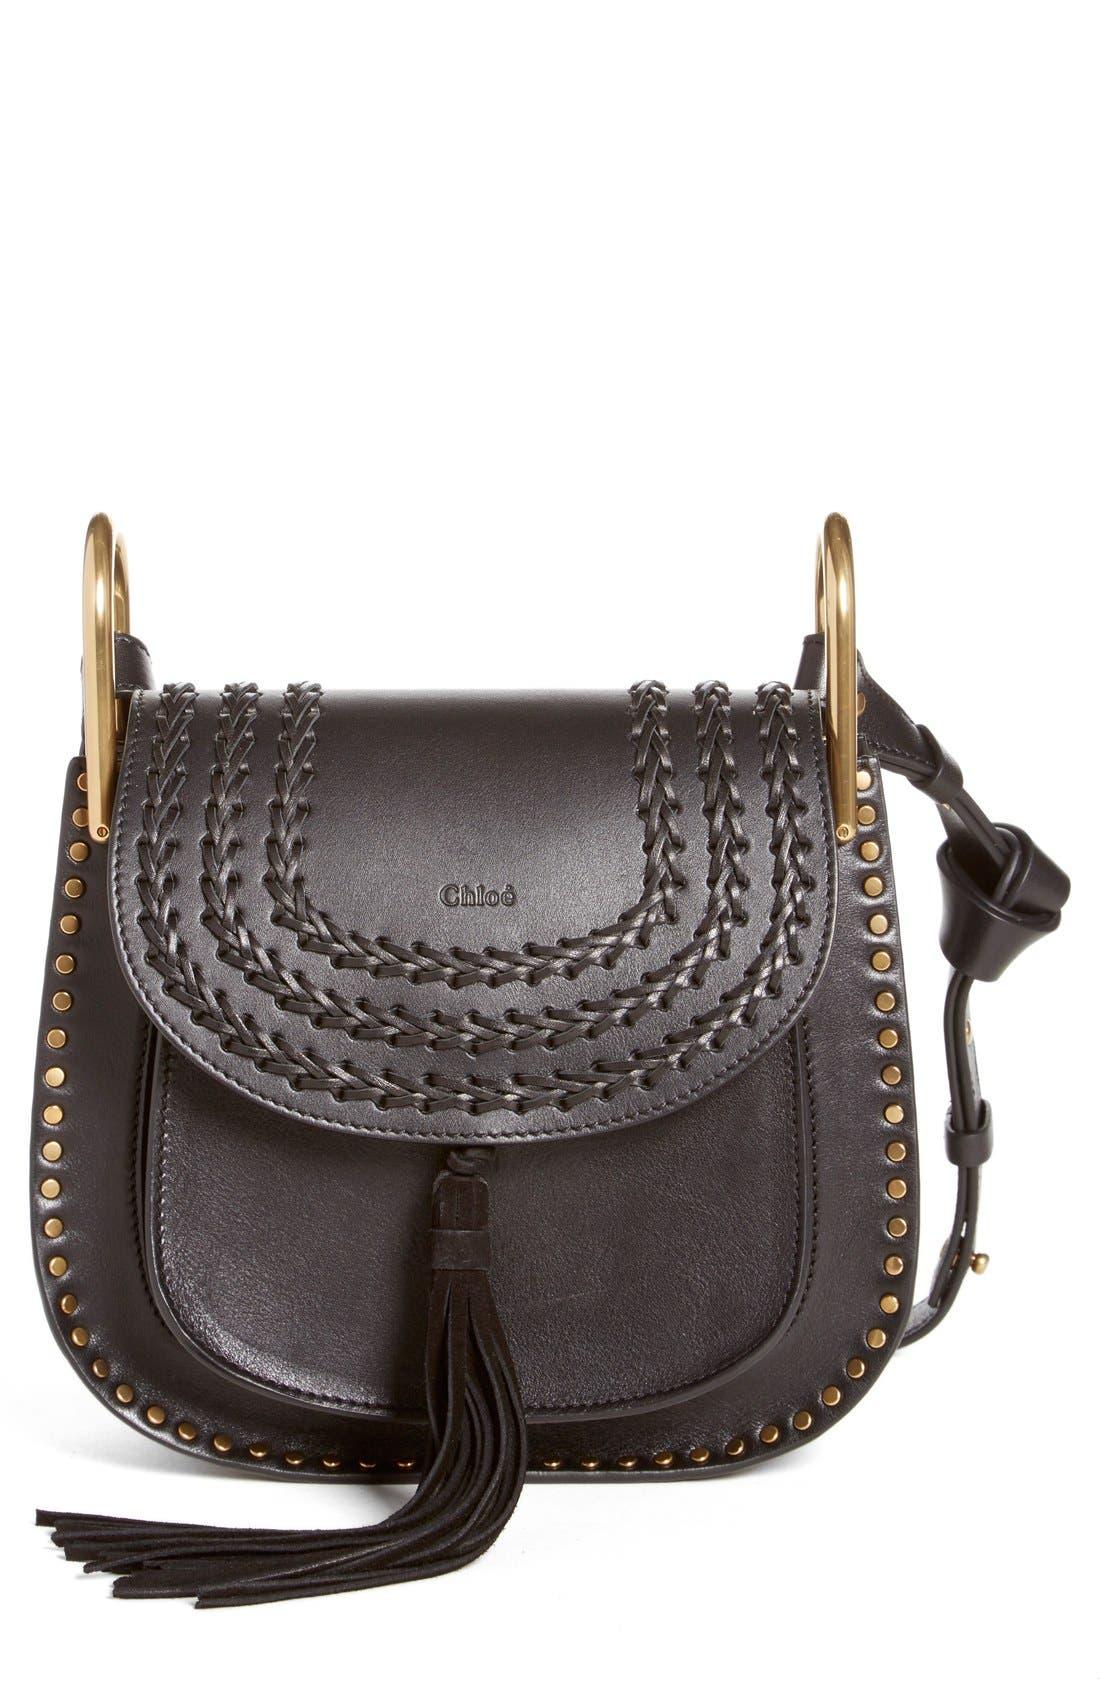 Main Image - Chloé 'Medium Hudson' Tassel Leather Shoulder Bag